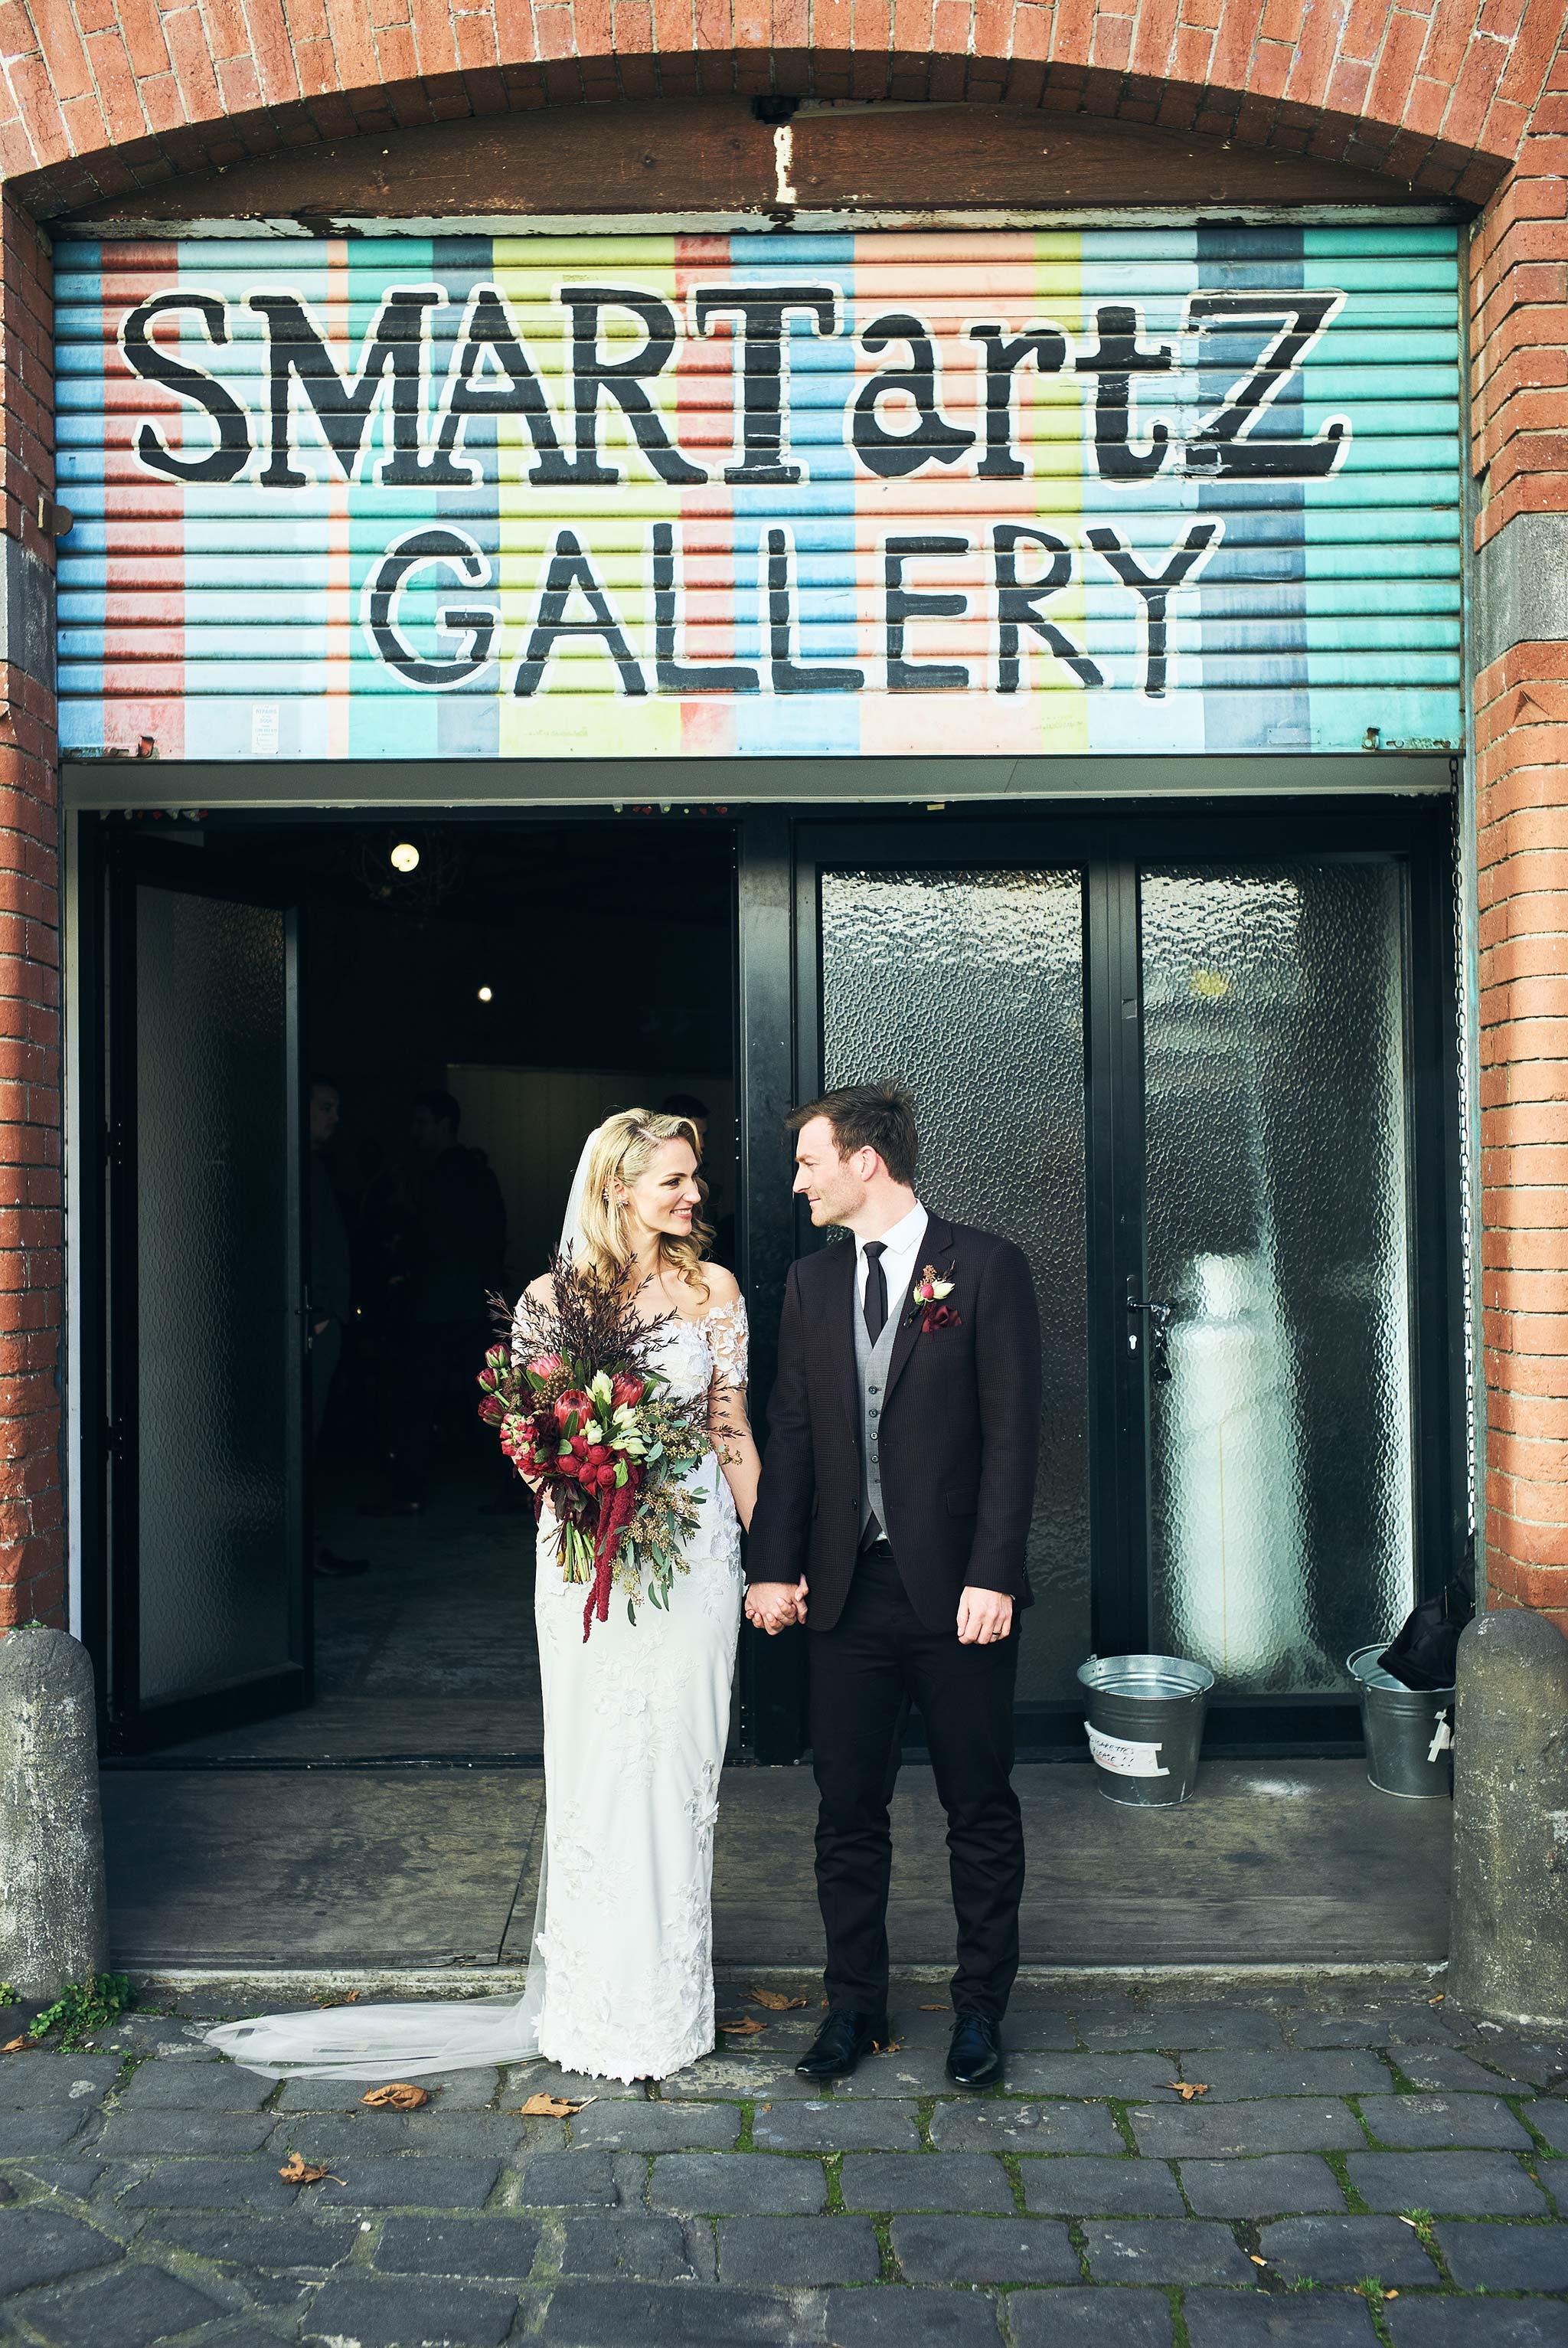 Melbourne-Wedding-Photographer-smartartz-gallery-ceremony-exit